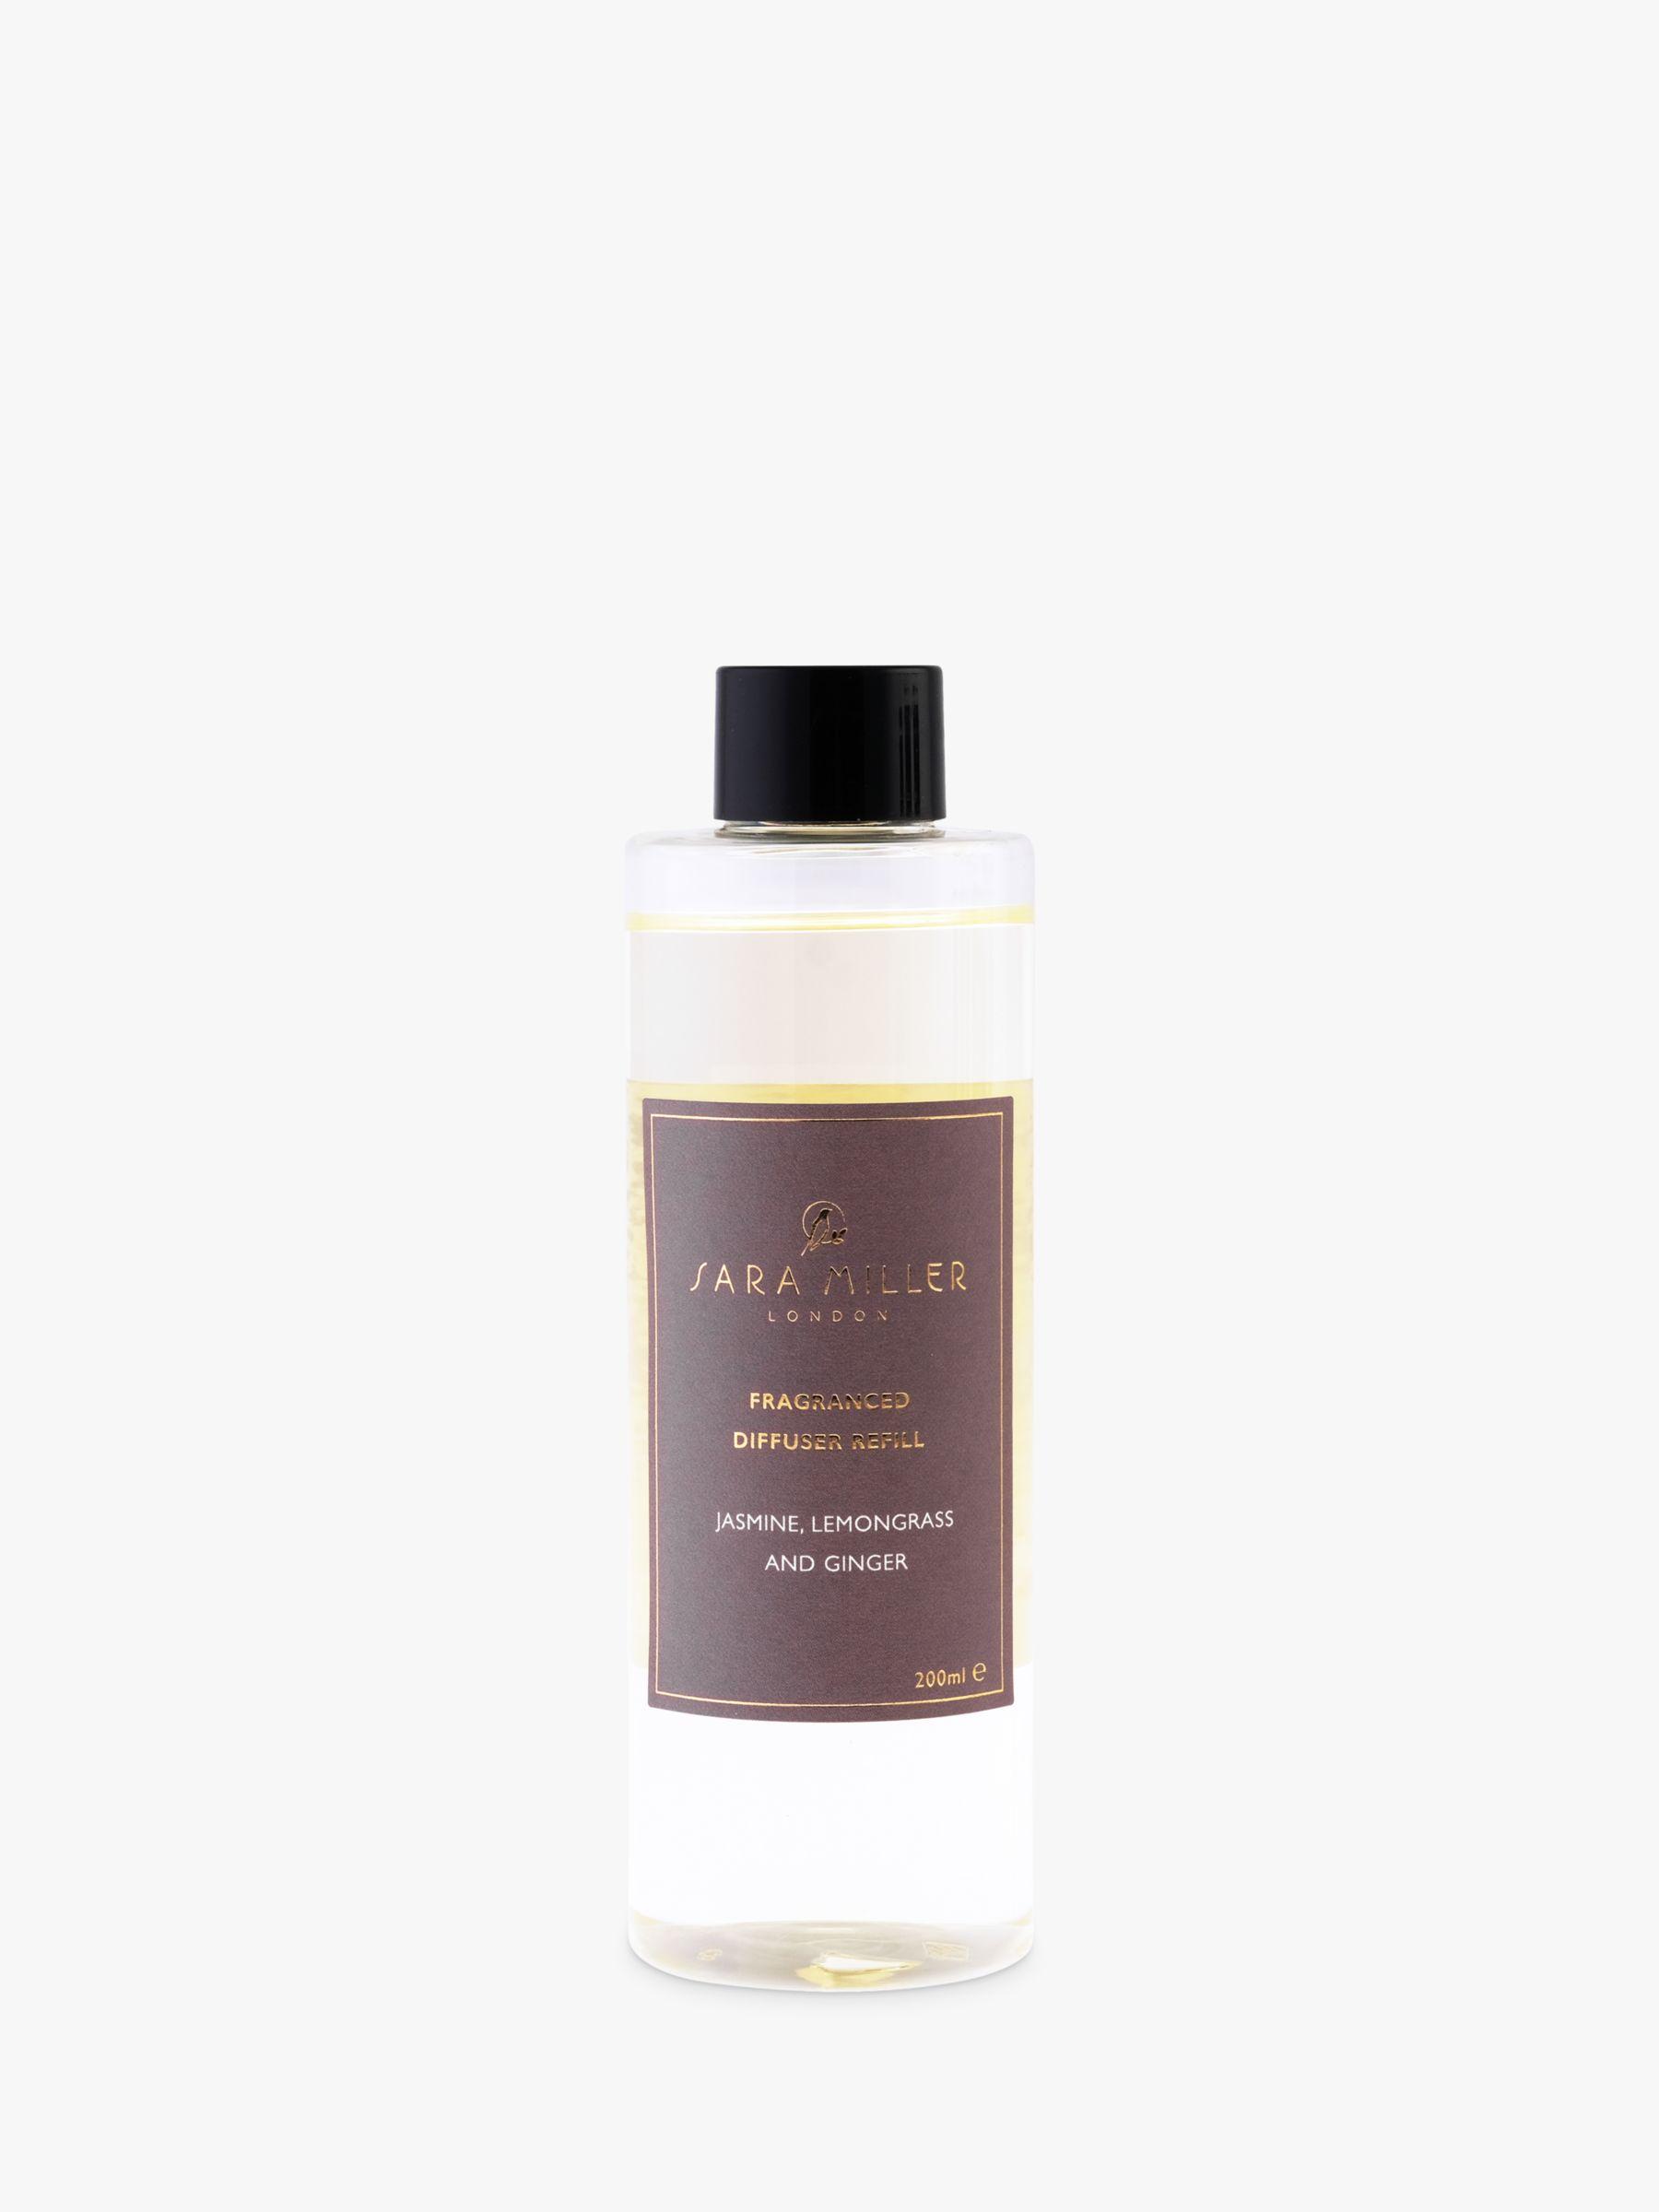 Sara Miller Grapfruit Tonca Yu Diffuser Refill 200ml At John Lewis Good Hair Spray Partners